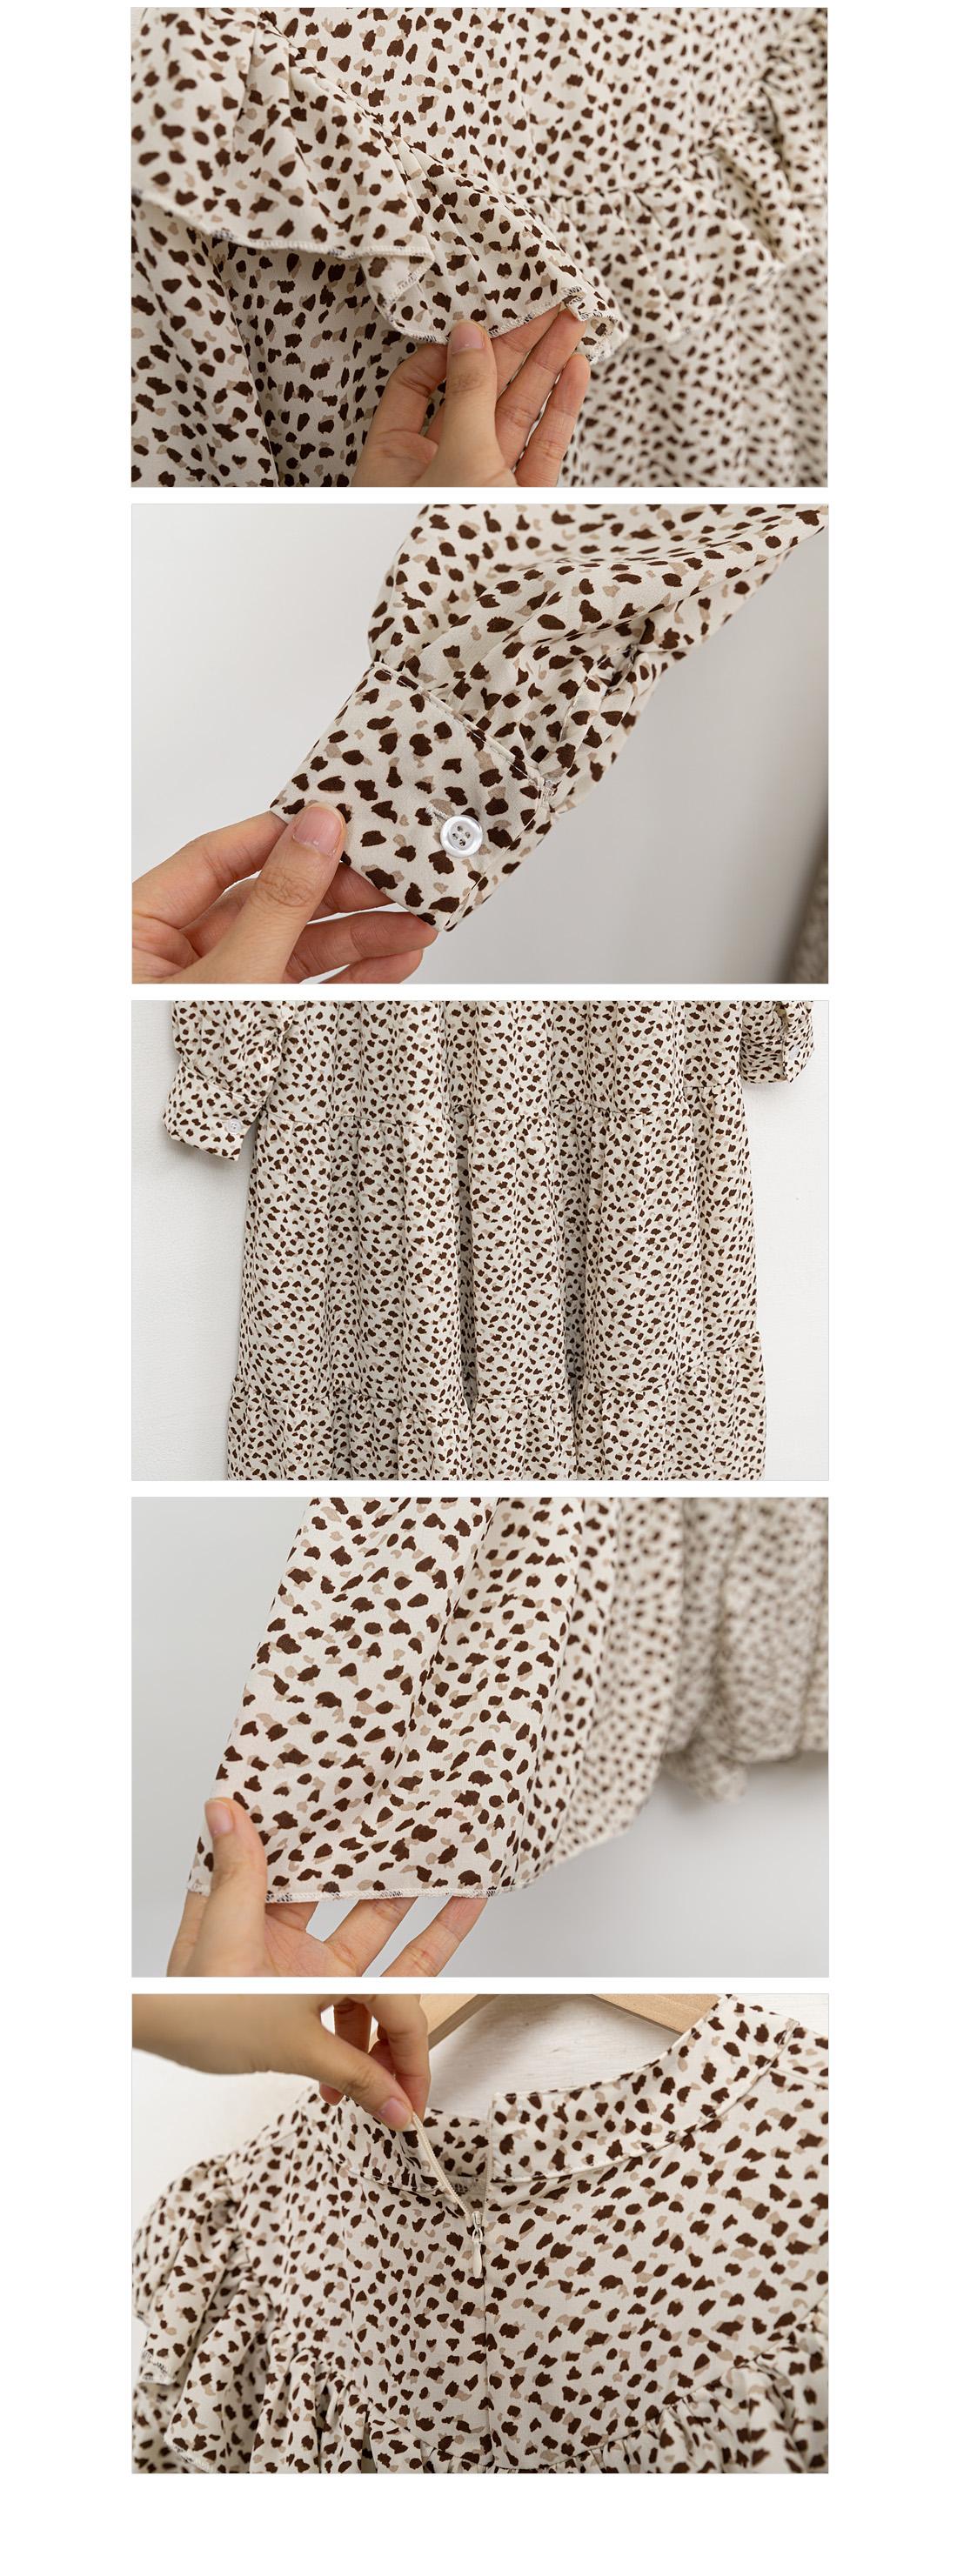 Dezzle Frill Cancan Dress #37826